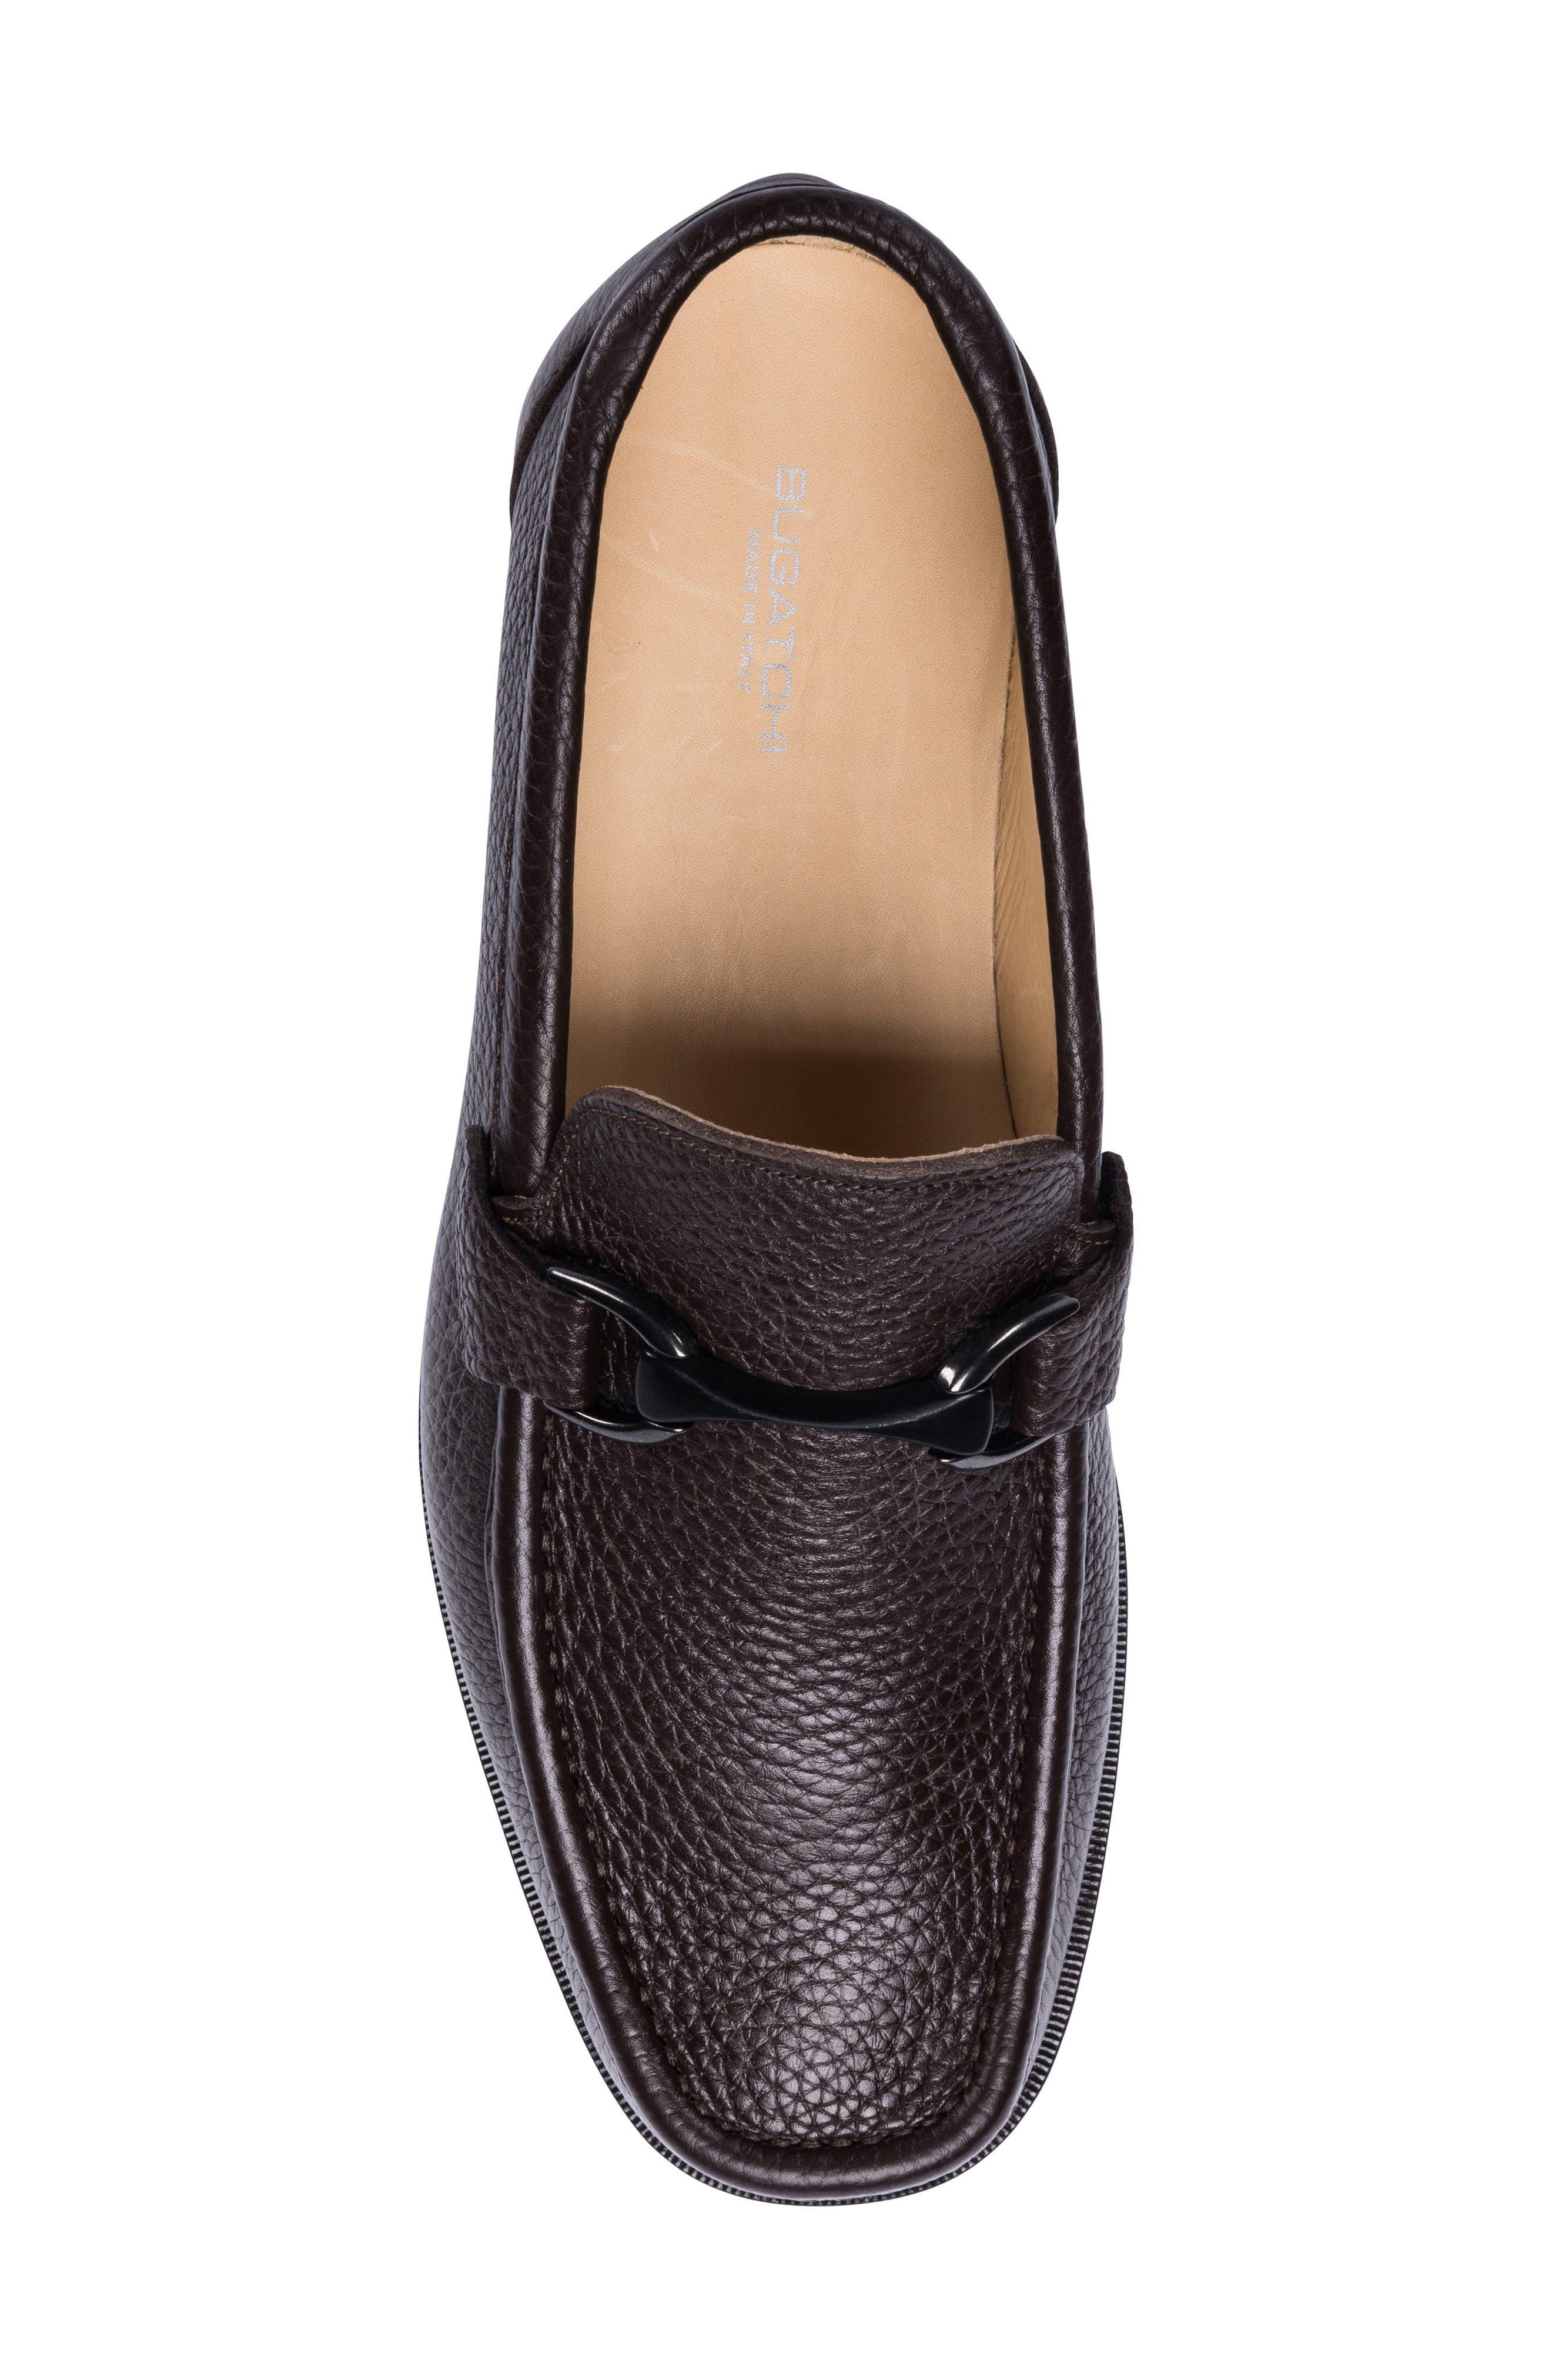 Padua Bit Loafer,                             Alternate thumbnail 5, color,                             Brown Leather